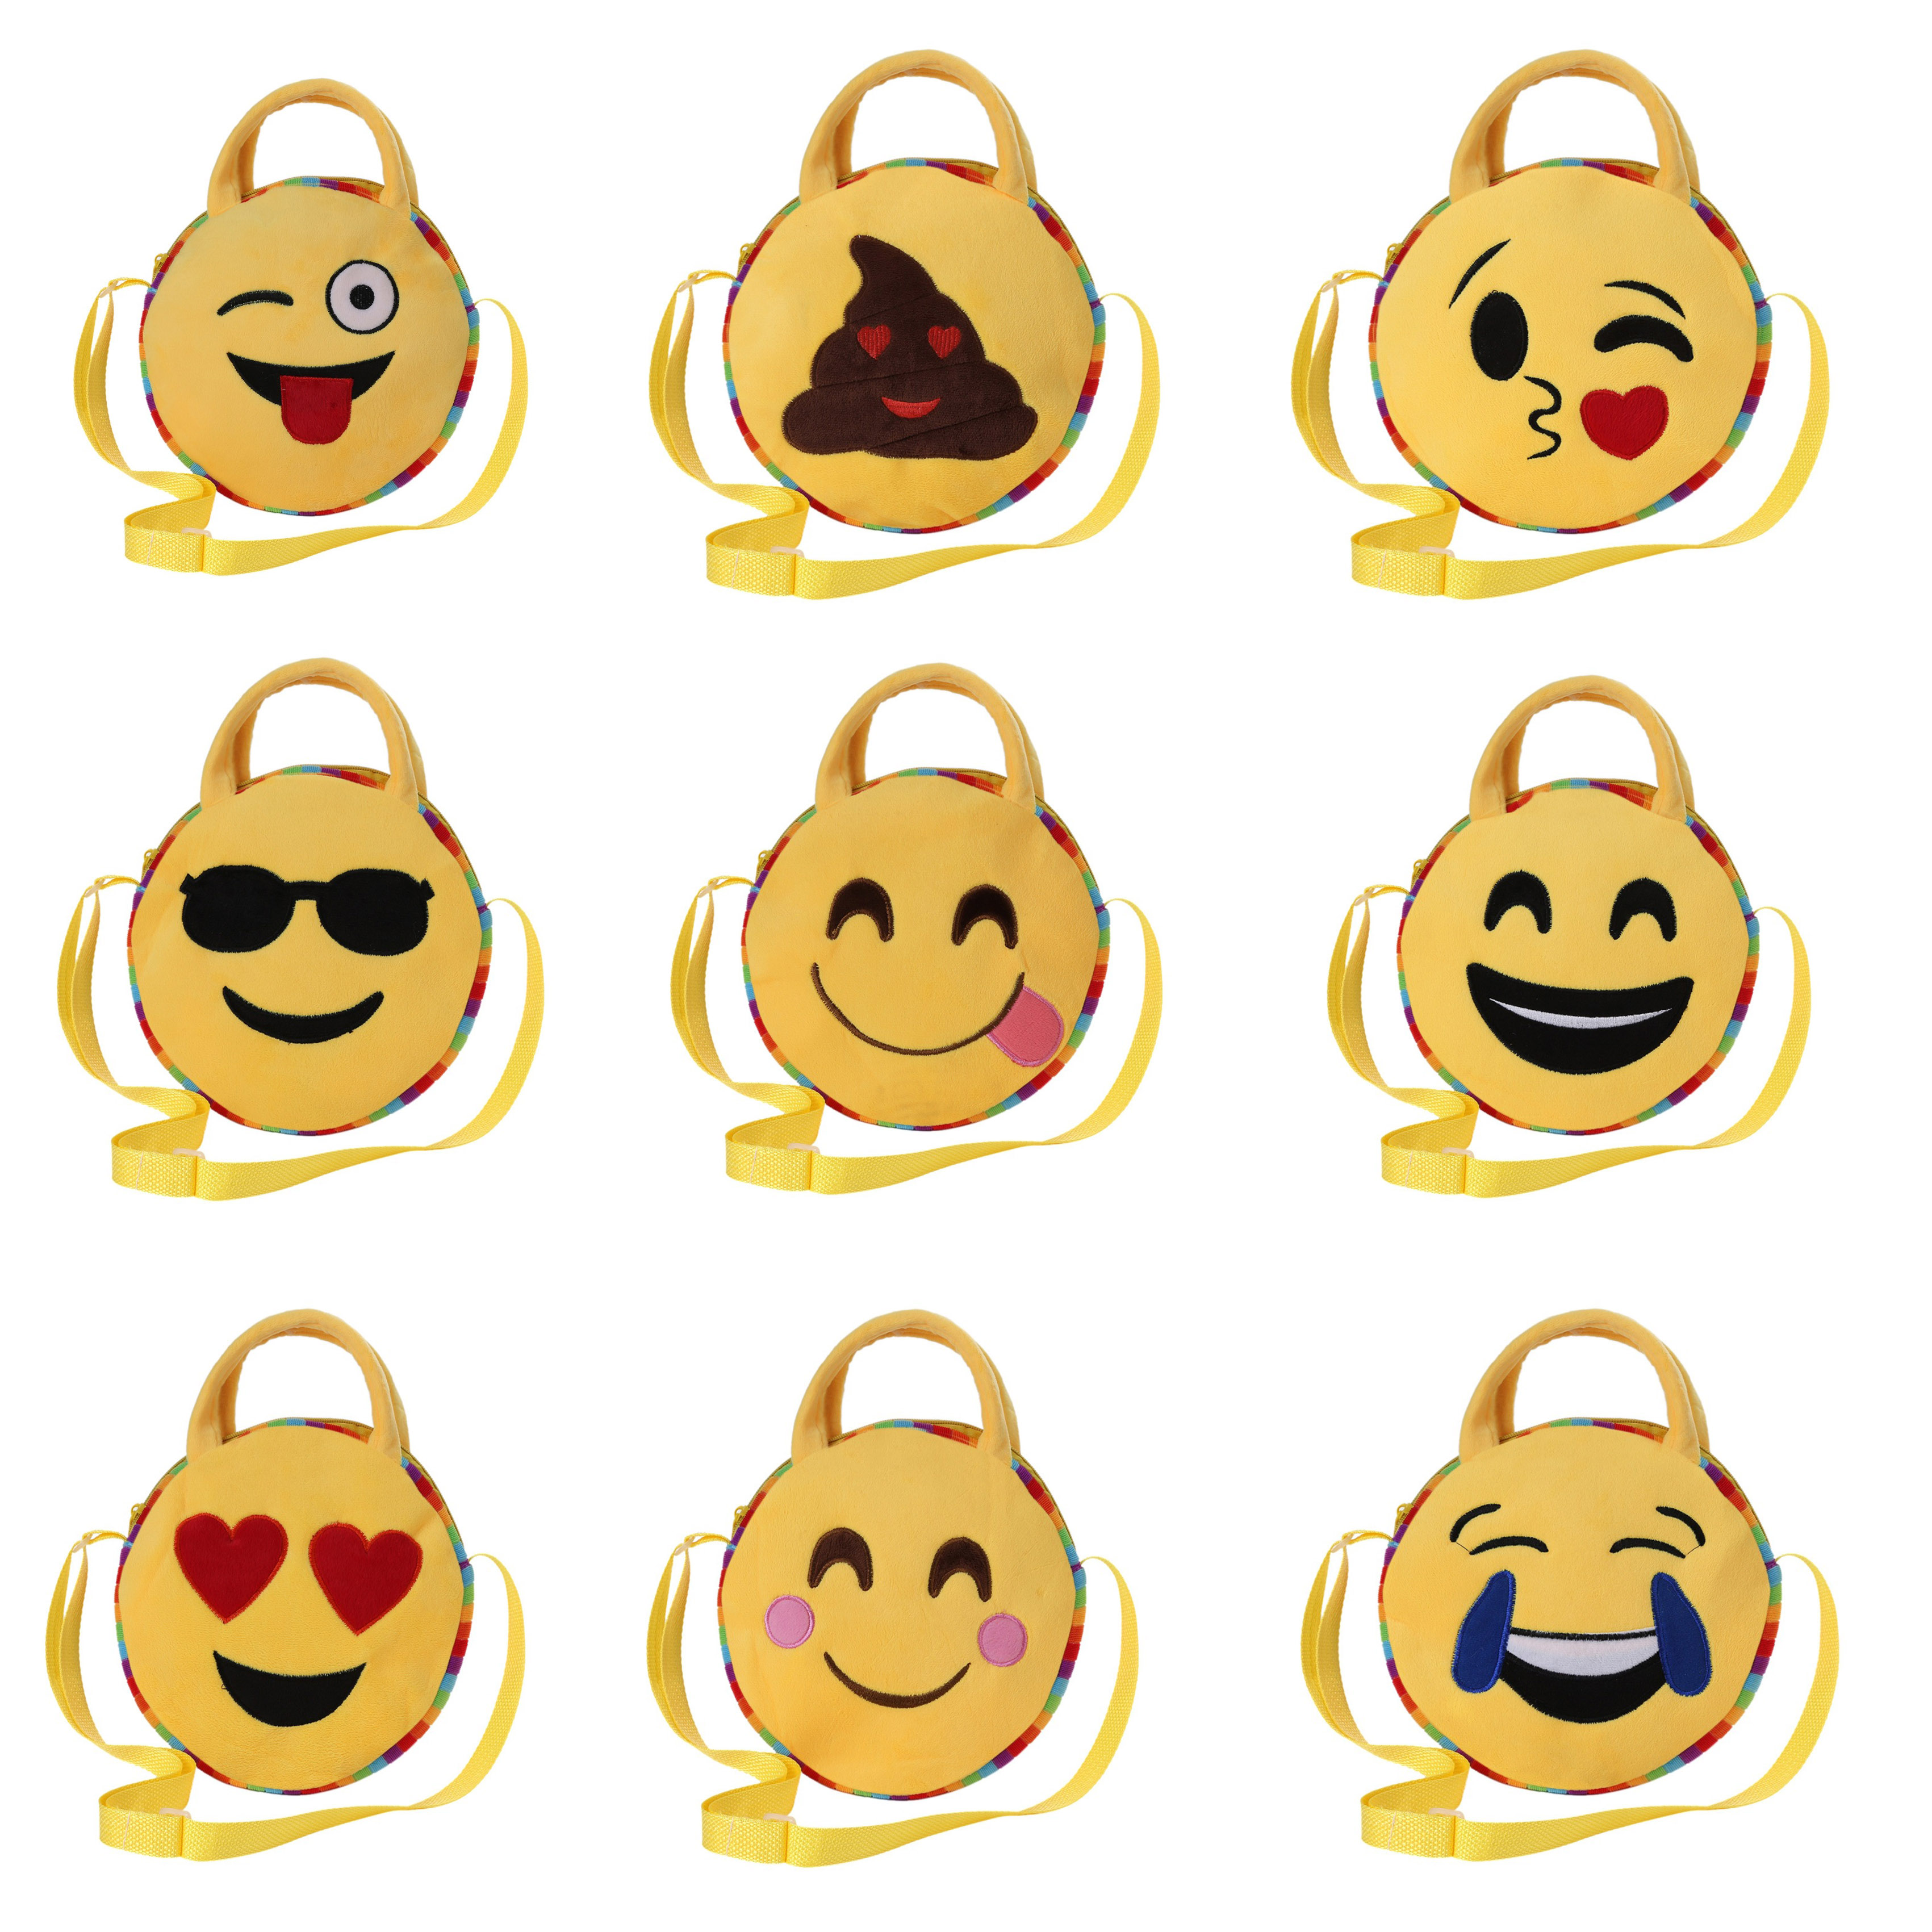 2017 Baru 10 Gaya Lucu Gadis Tas Mewah Ransel Satchel Kartun Emoji Emoticon Handsbag Tas Mini Emoticon Whatsapp untuk Anak di Ransel mewah dari Mainan